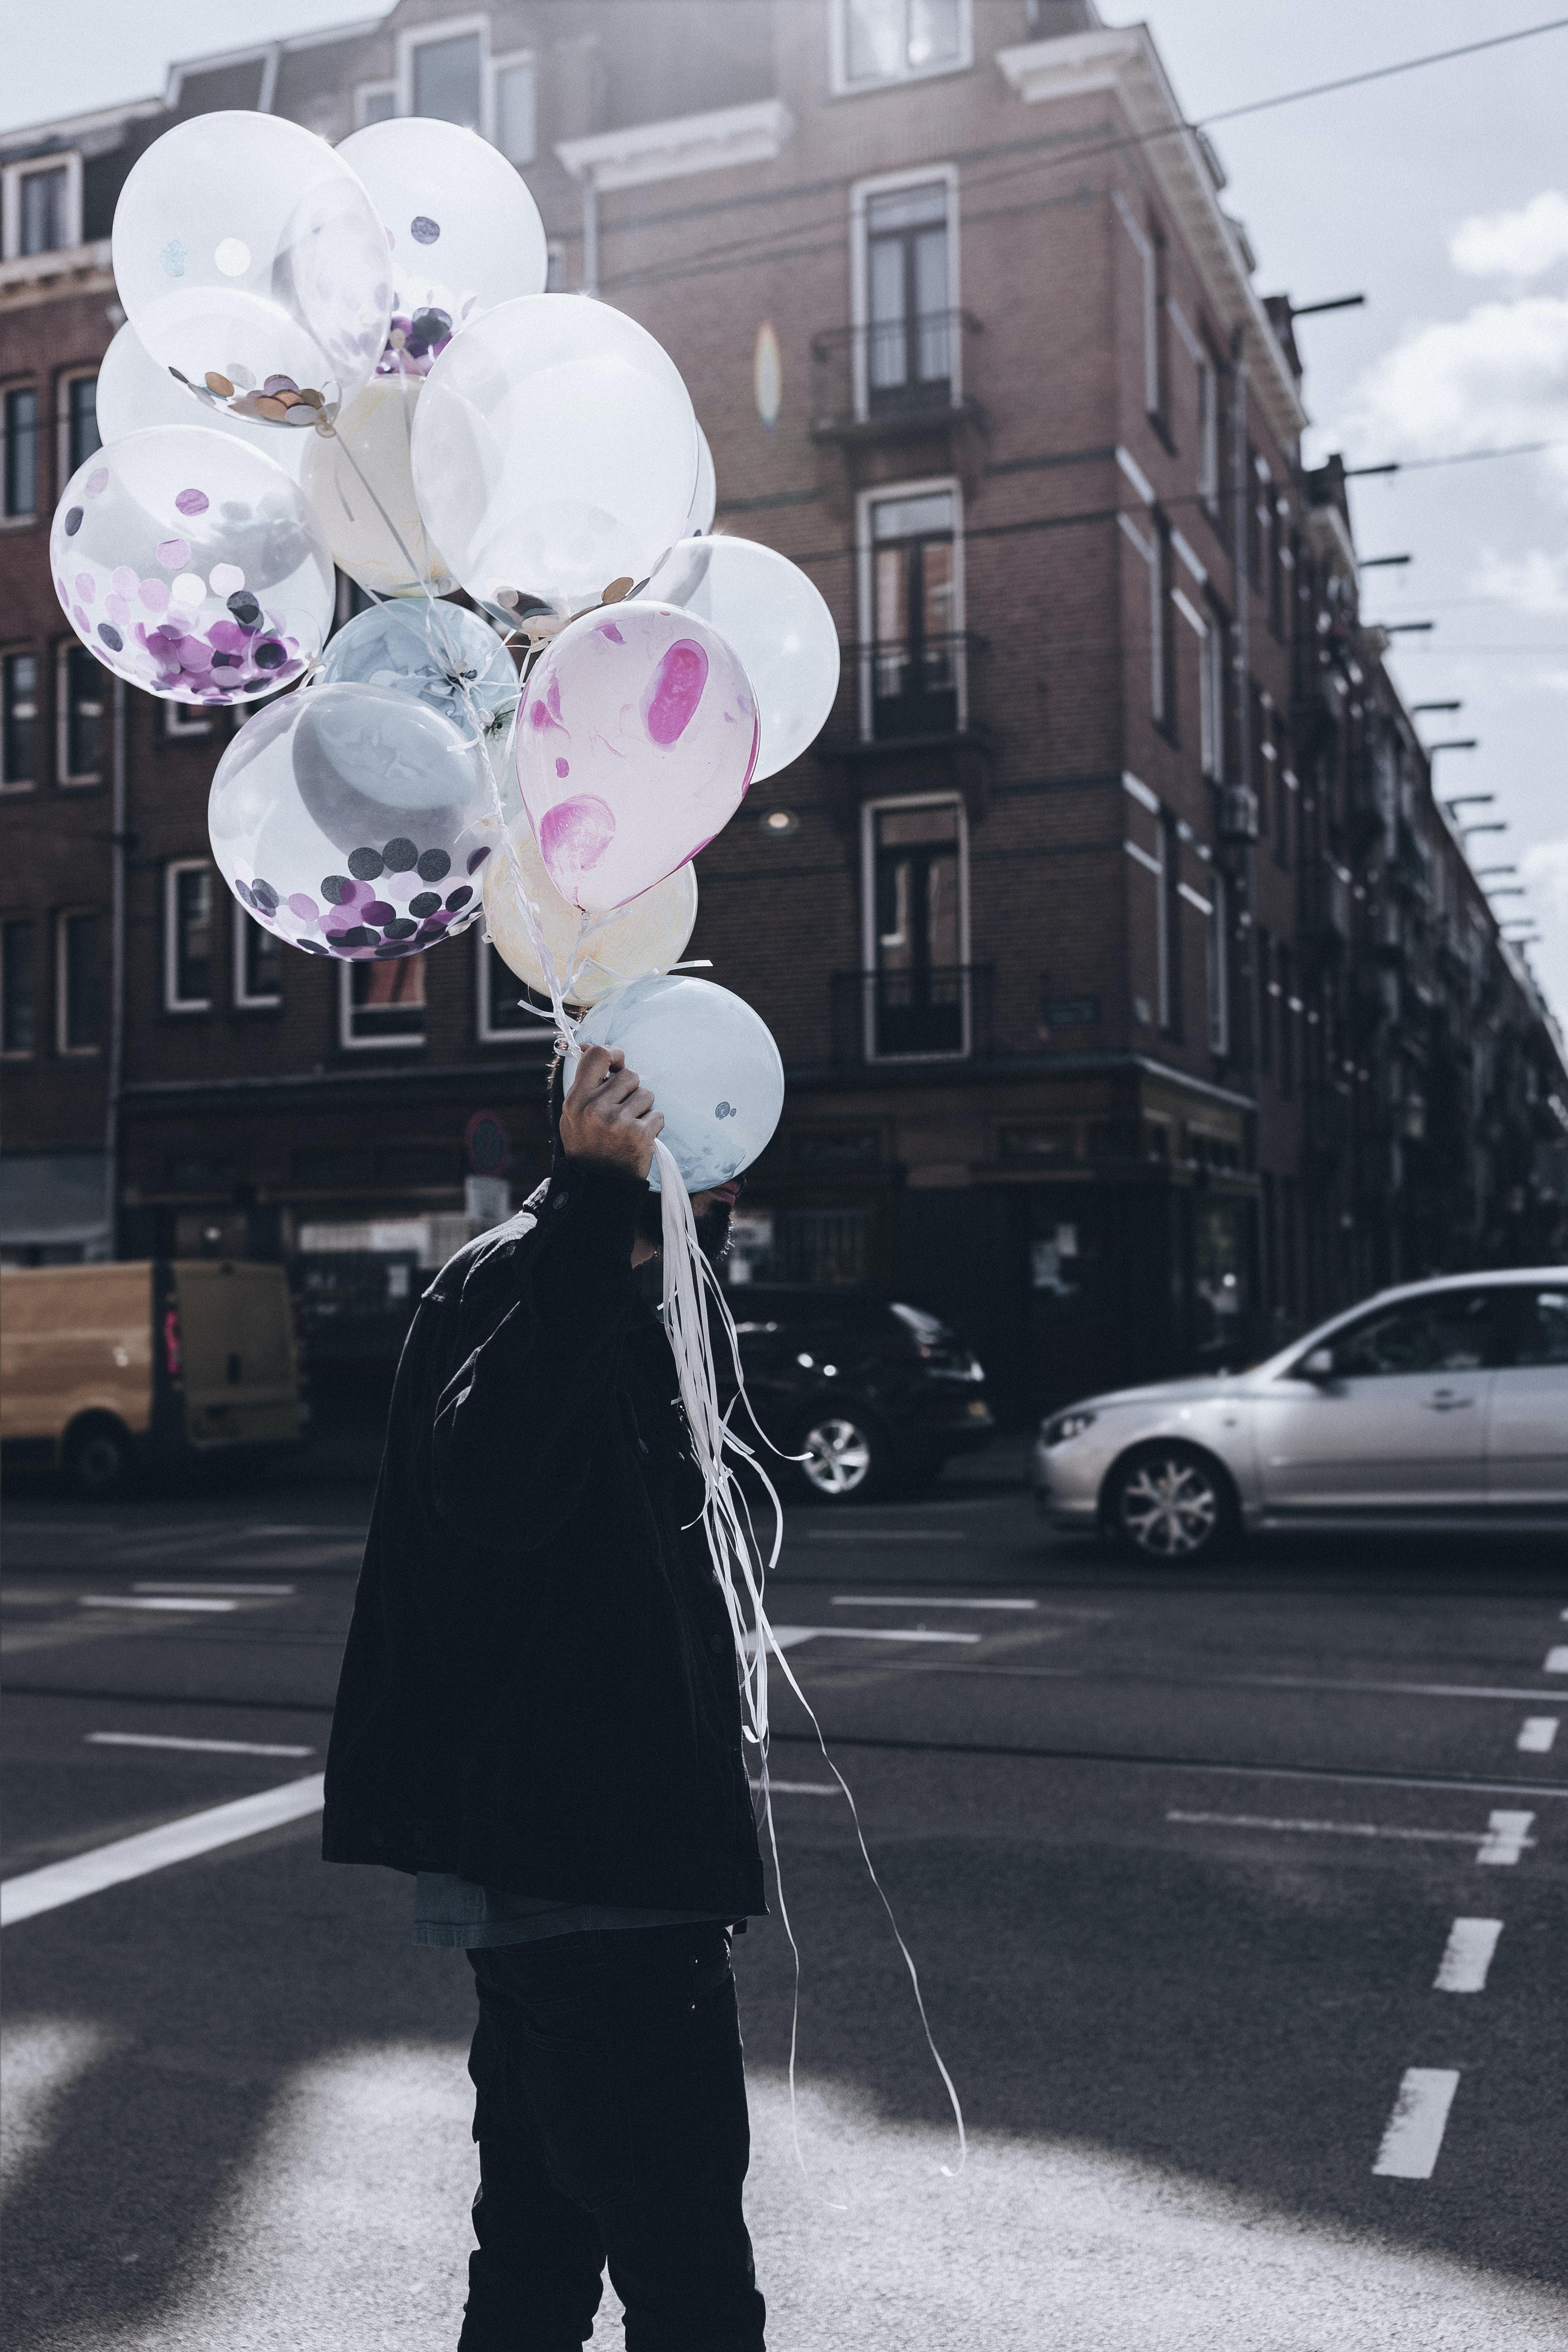 man holding white balloon walking on street during day time